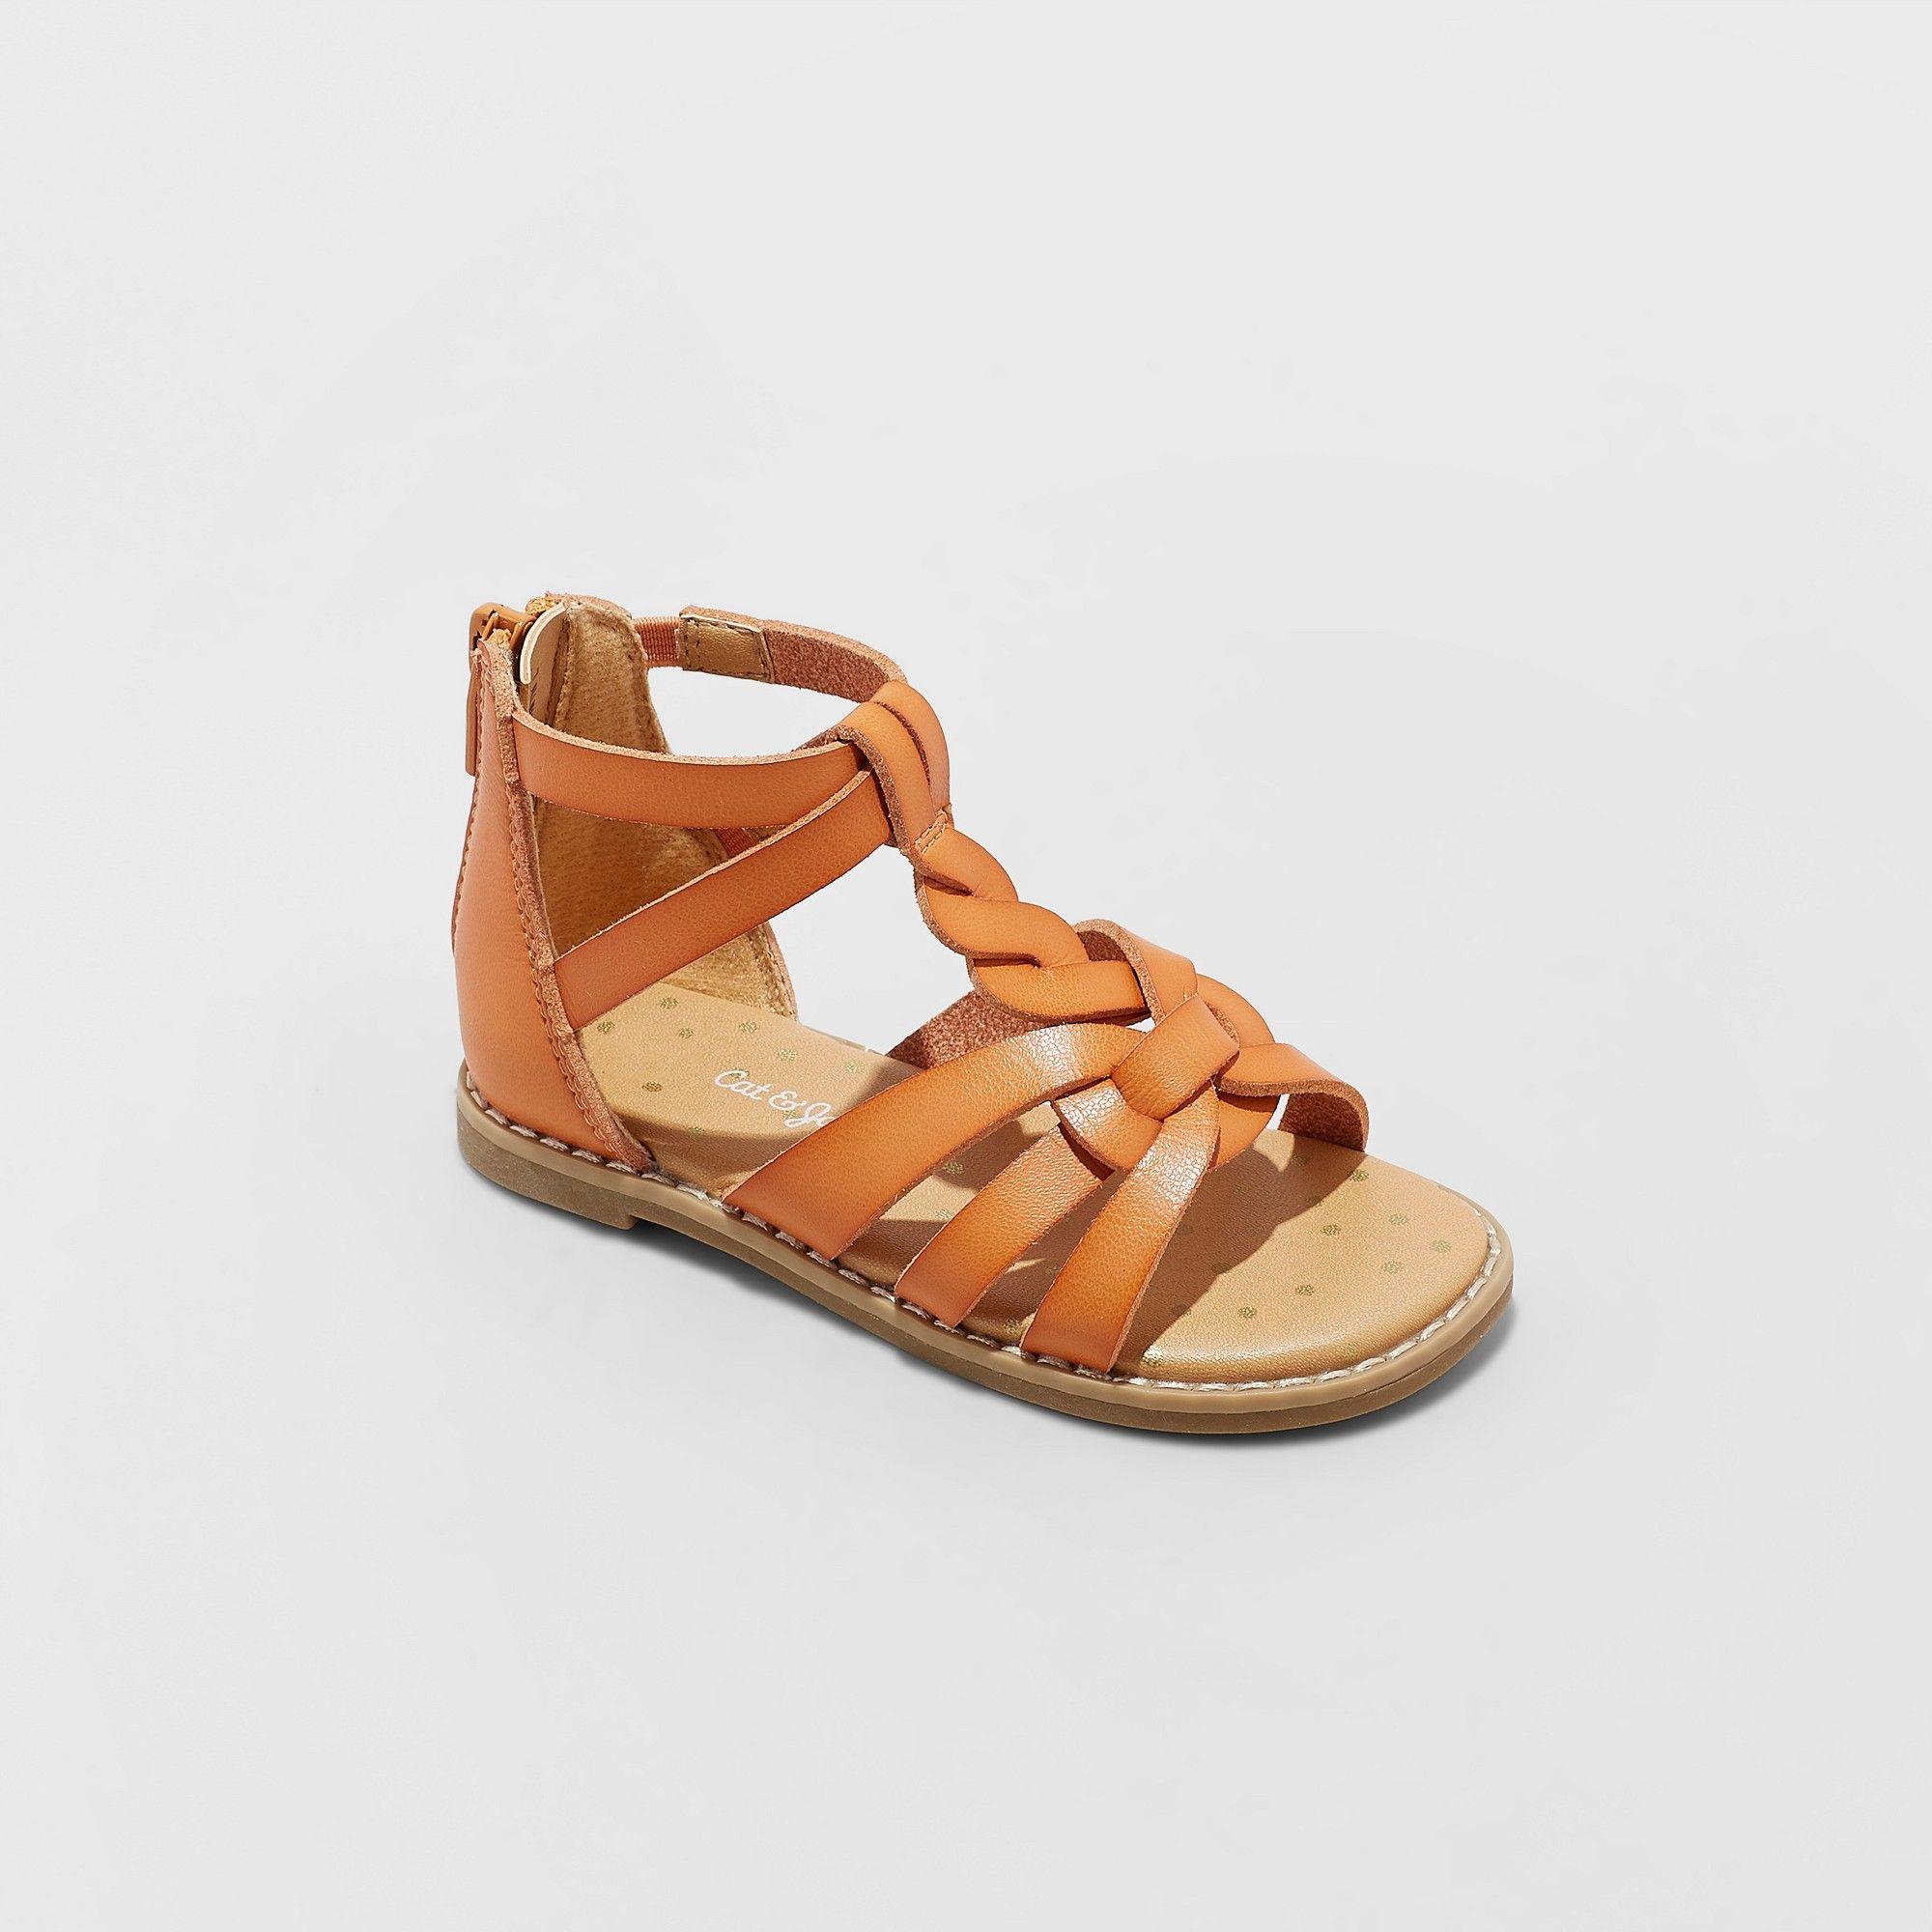 9a620fbf1c79 Toddler Girls  Kairi Gladiator Sandals - Cat   Jack Cognac 10